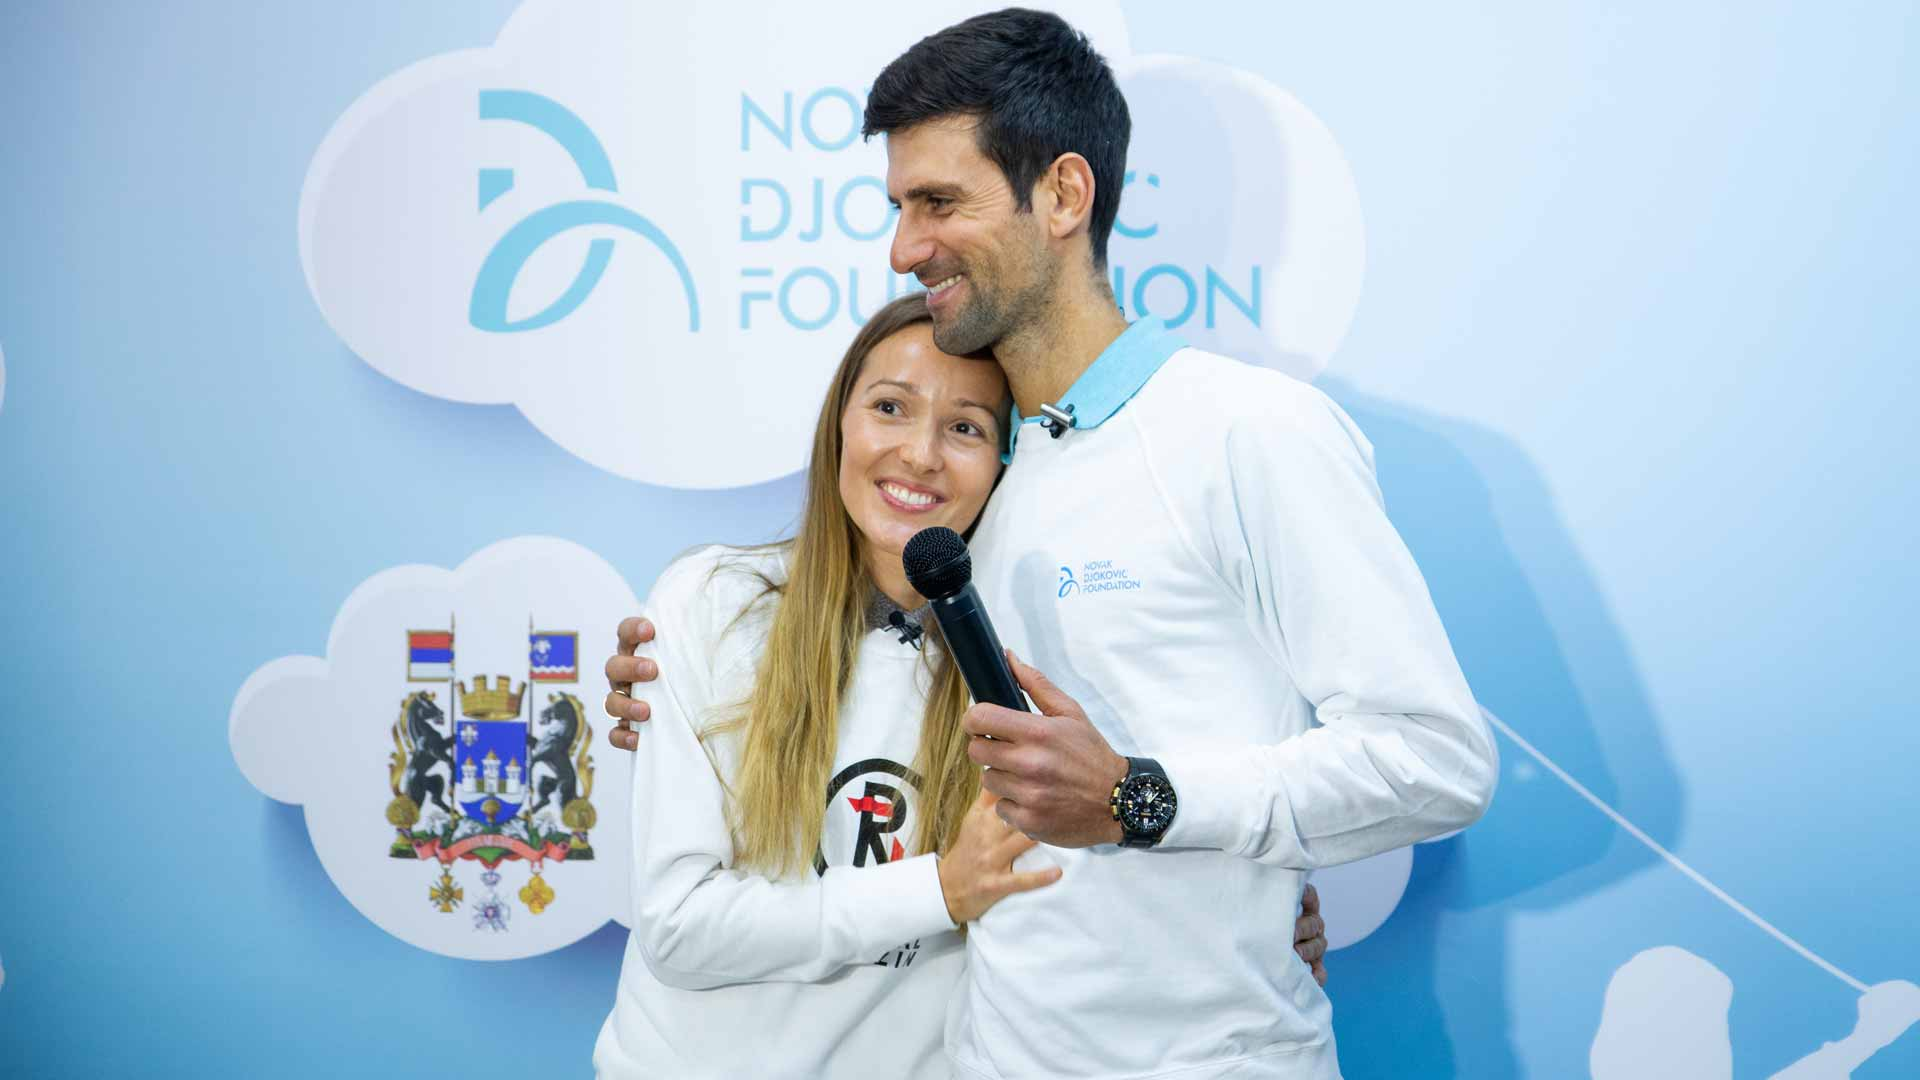 Jelena Djokovic, <a href='https://www.atptour.com/en/players/novak-djokovic/d643/overview'>Novak Djokovic</a>